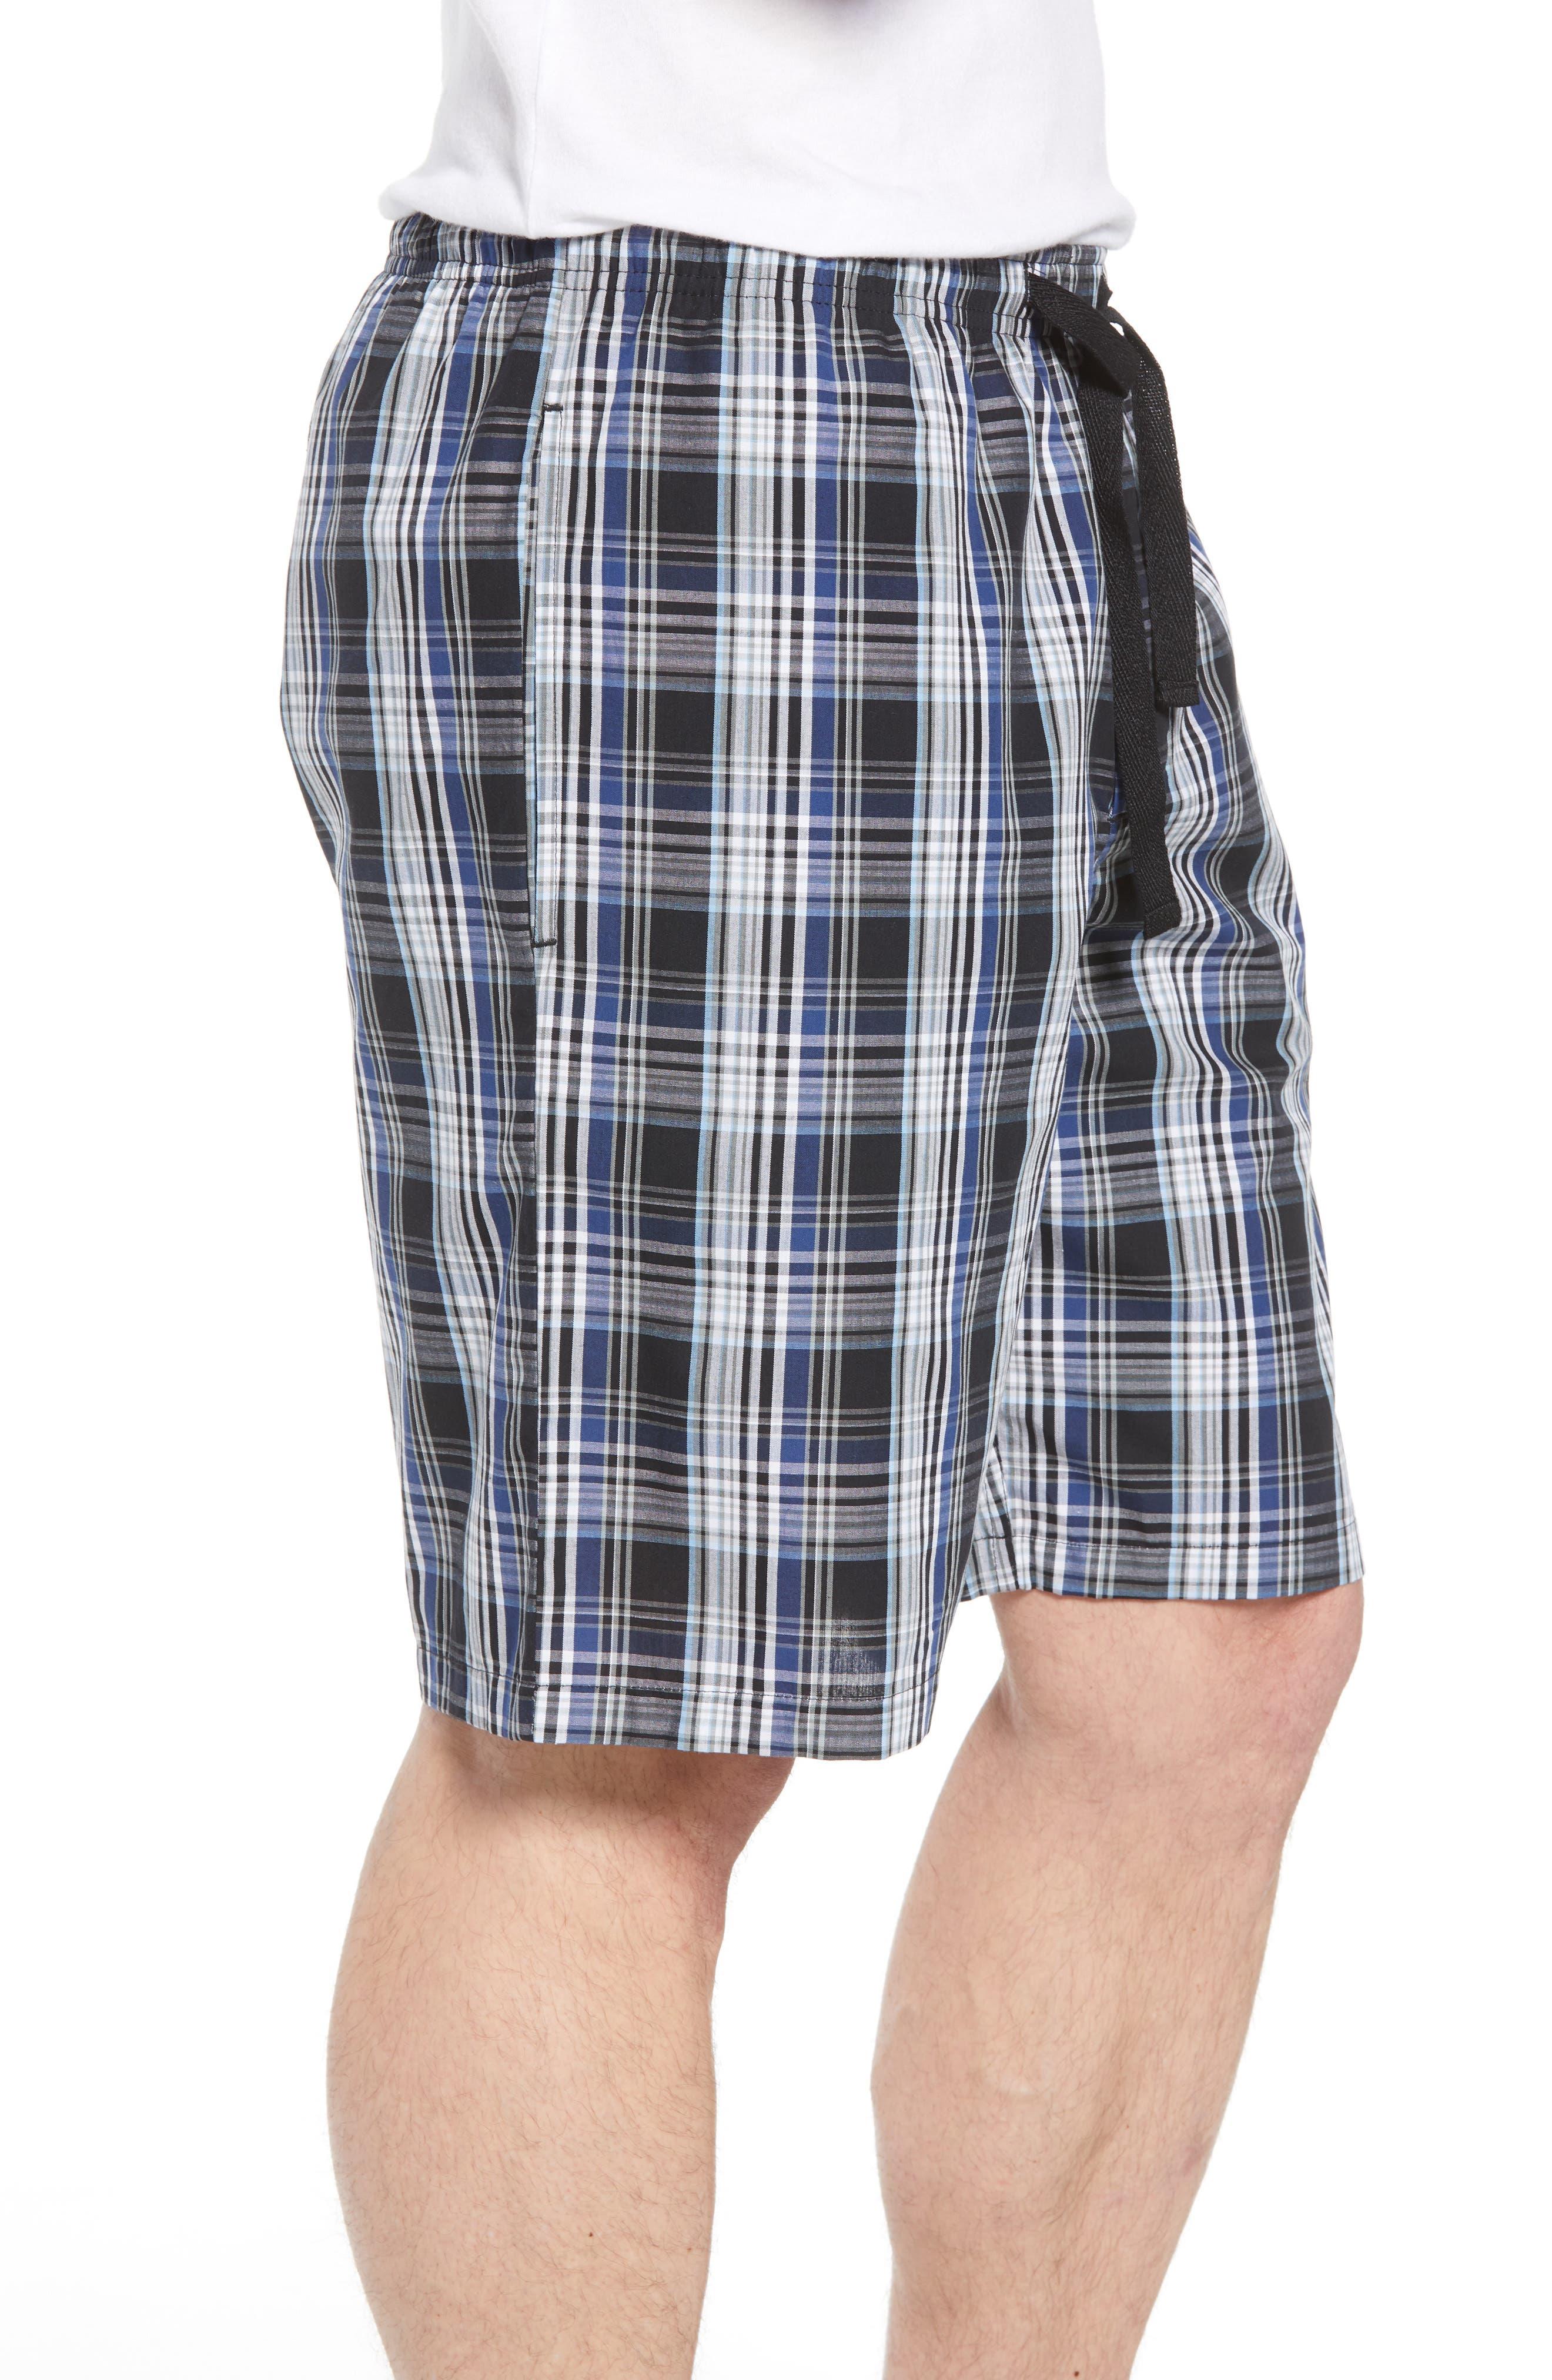 NORDSTROM MEN'S SHOP, Poplin Lounge Shorts, Alternate thumbnail 3, color, BLACK TWILIGHT BLUE PLAID